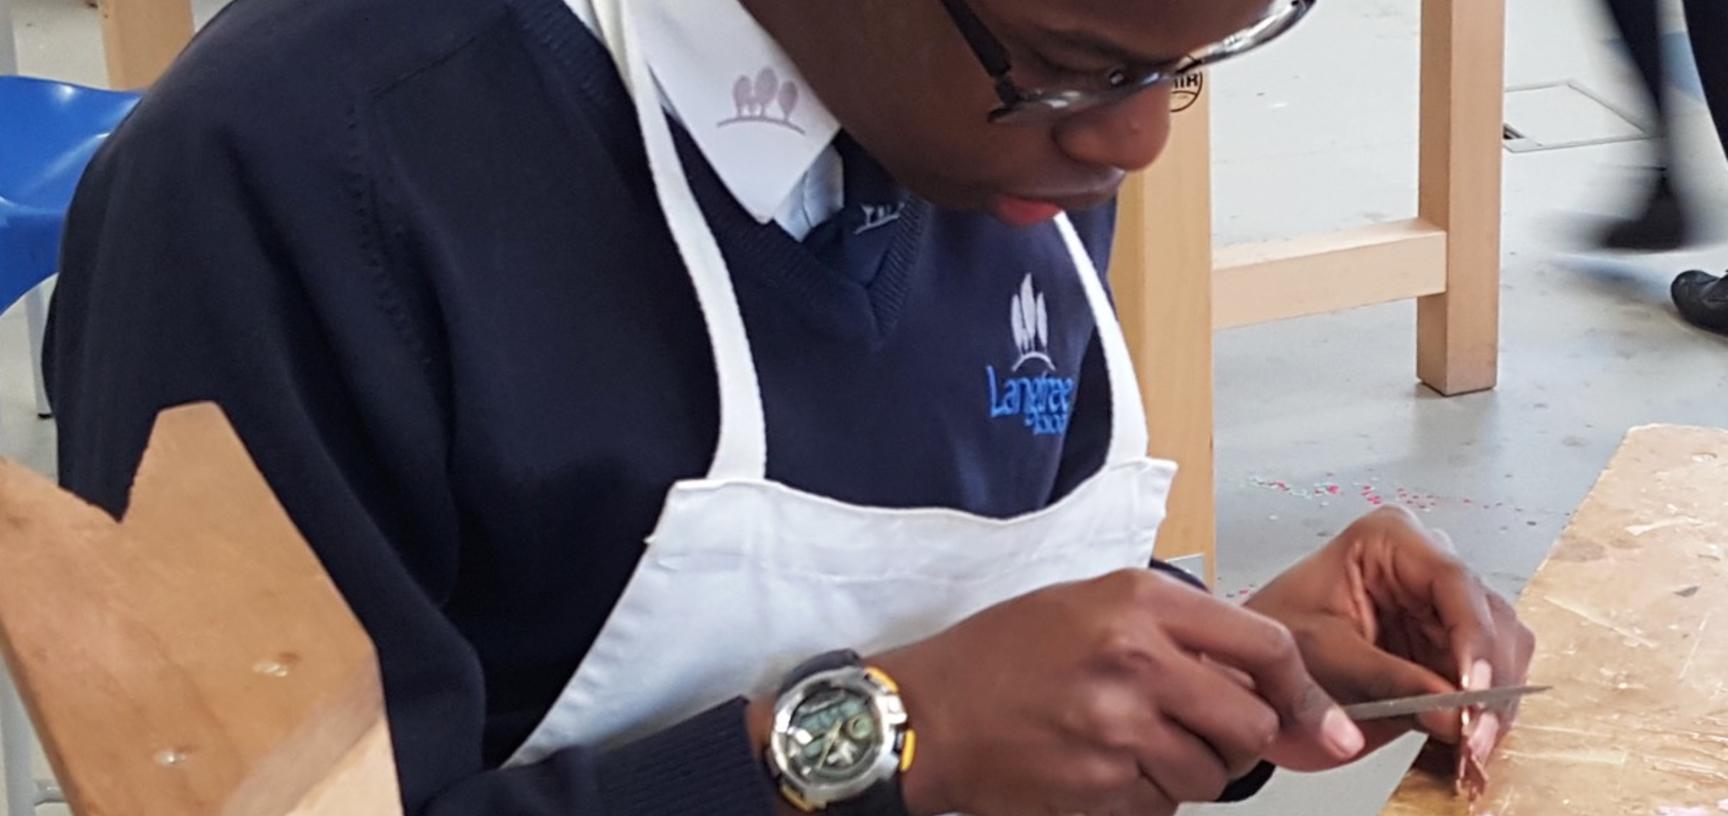 Student working on a teaspoon (Copyright Langtree School)